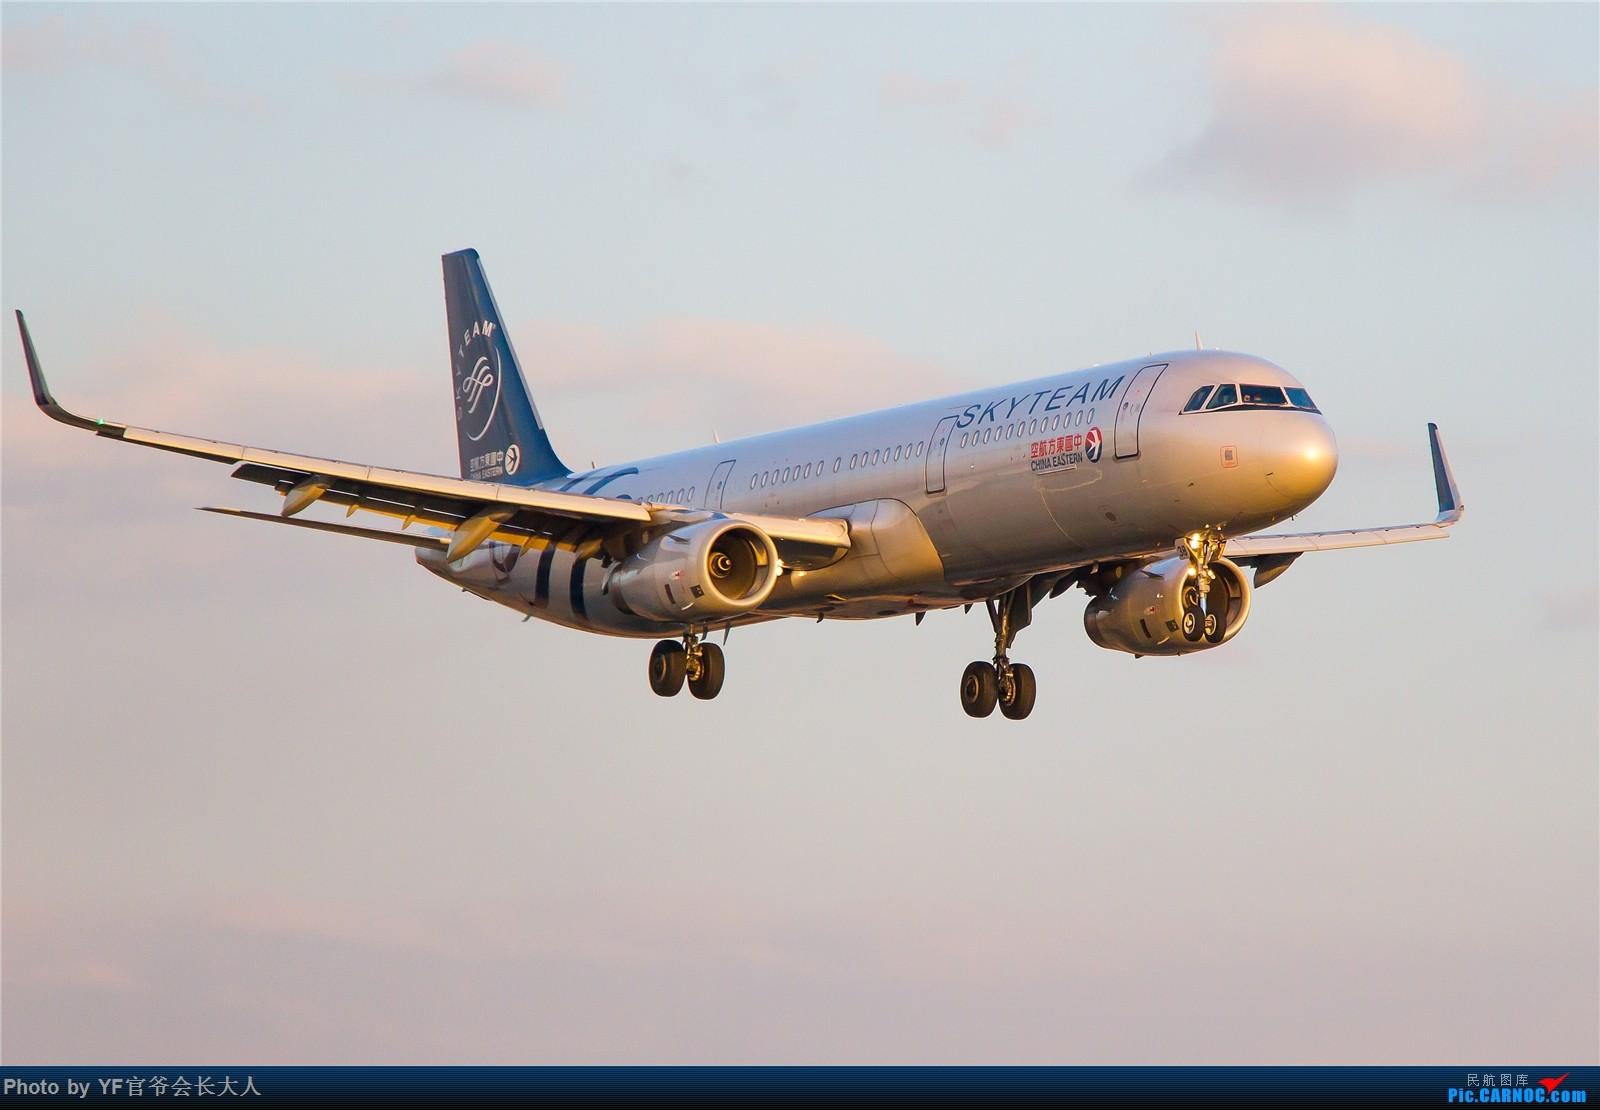 Re:[原创]【ZYTX】【1600*1066】论坛首发:俄罗斯艾菲航空公司波音757-28A,注册号:EI-EWT,还有757斯基以及最近新拍机点拍的一些好货 AIRBUS A321-200 B-1838 中国沈阳桃仙国际机场